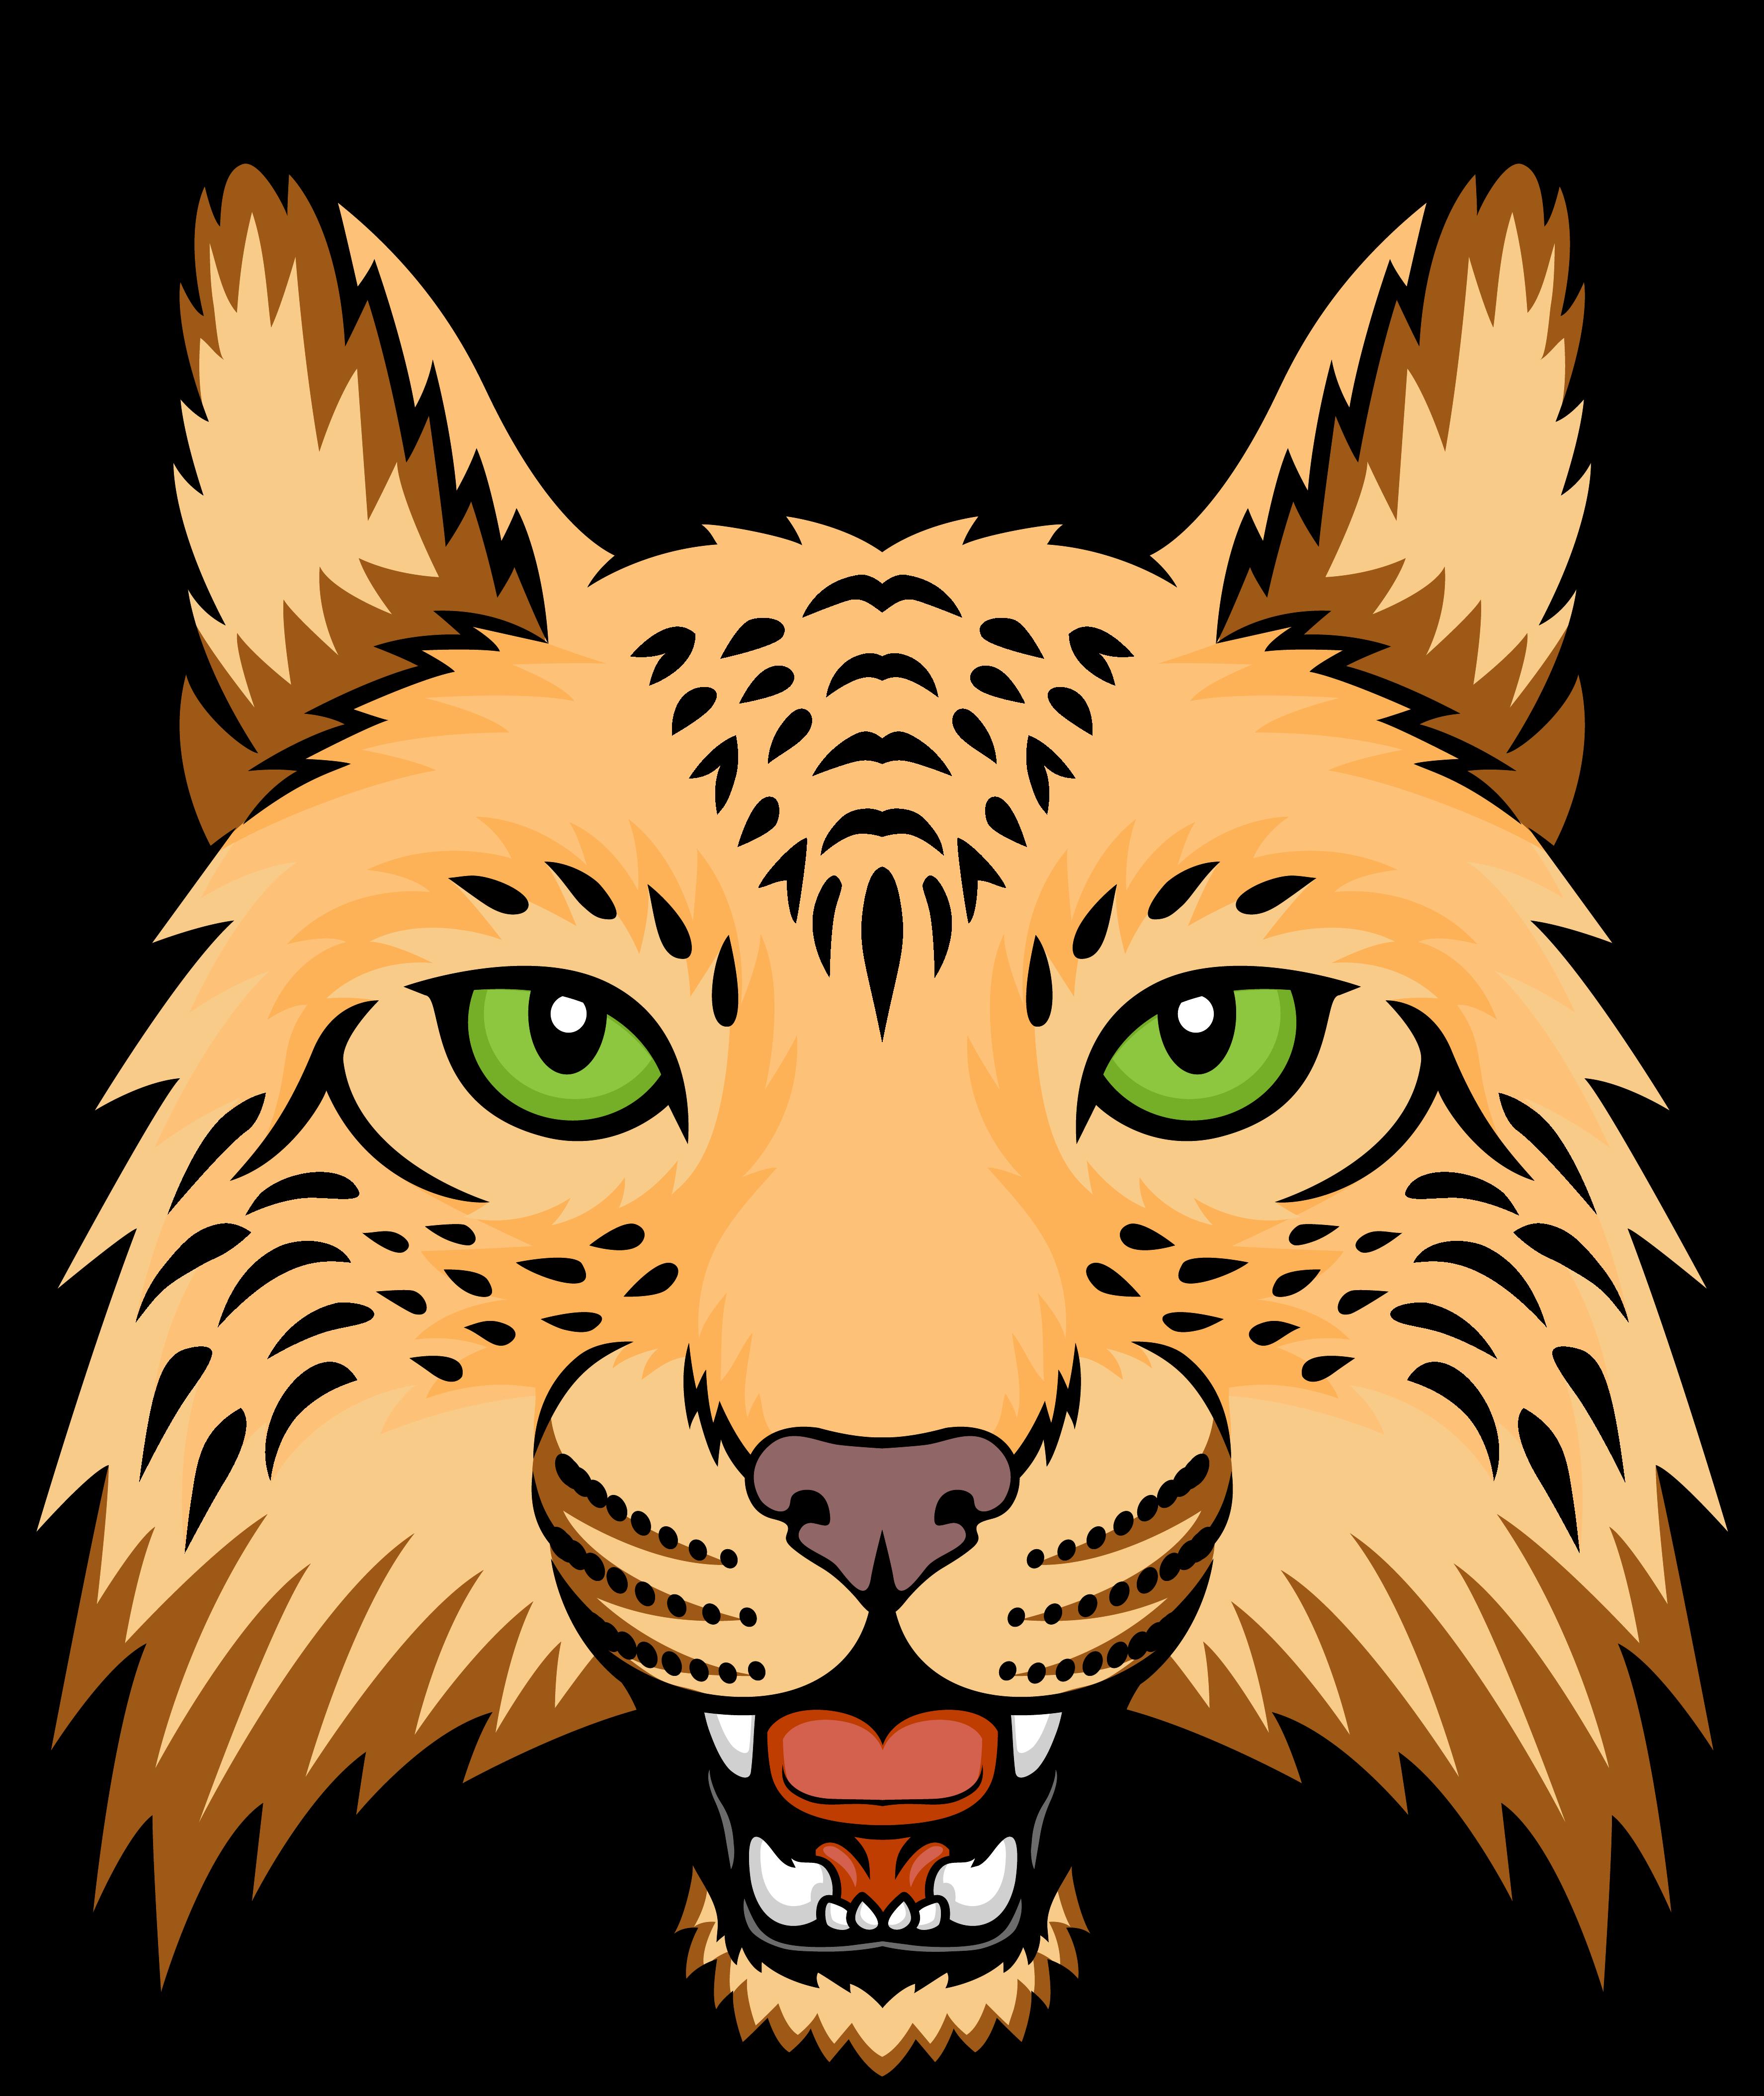 Banner free stock illustration. Bobcat clipart template